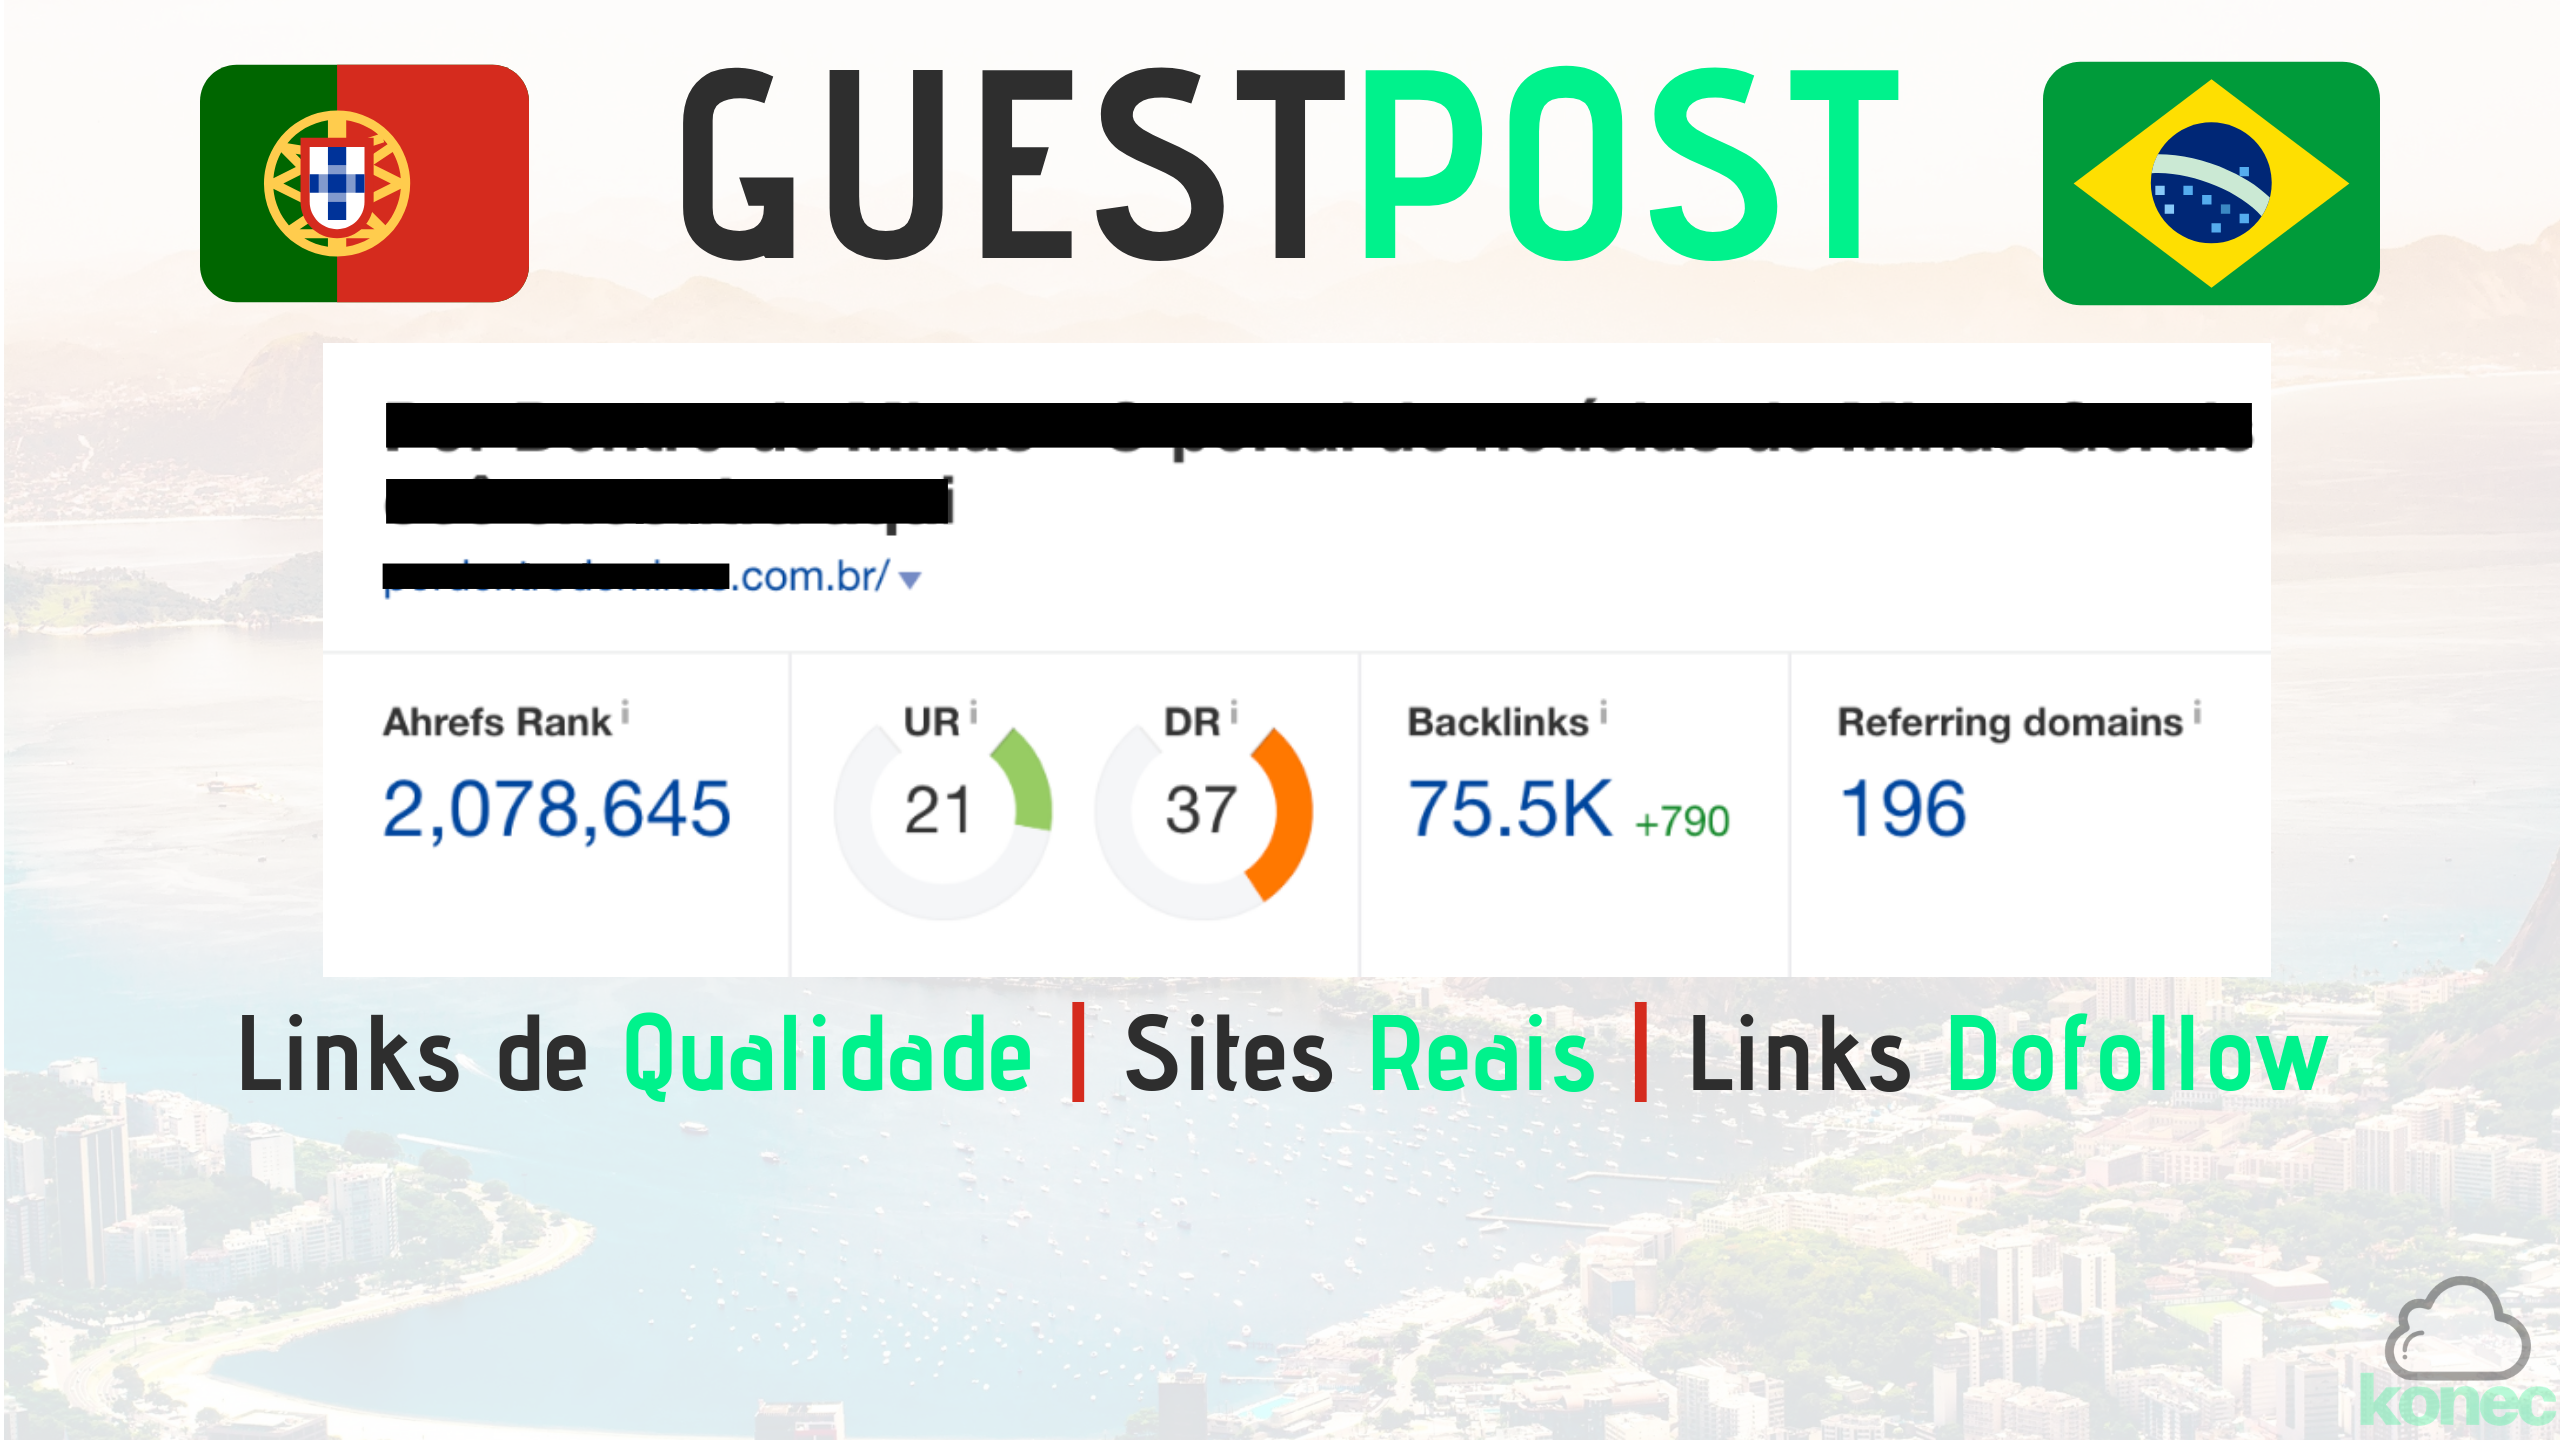 links-portugueses-portugal-brasil-brazil-guest-post-qualidade-dofollow-seo-para-lisboa